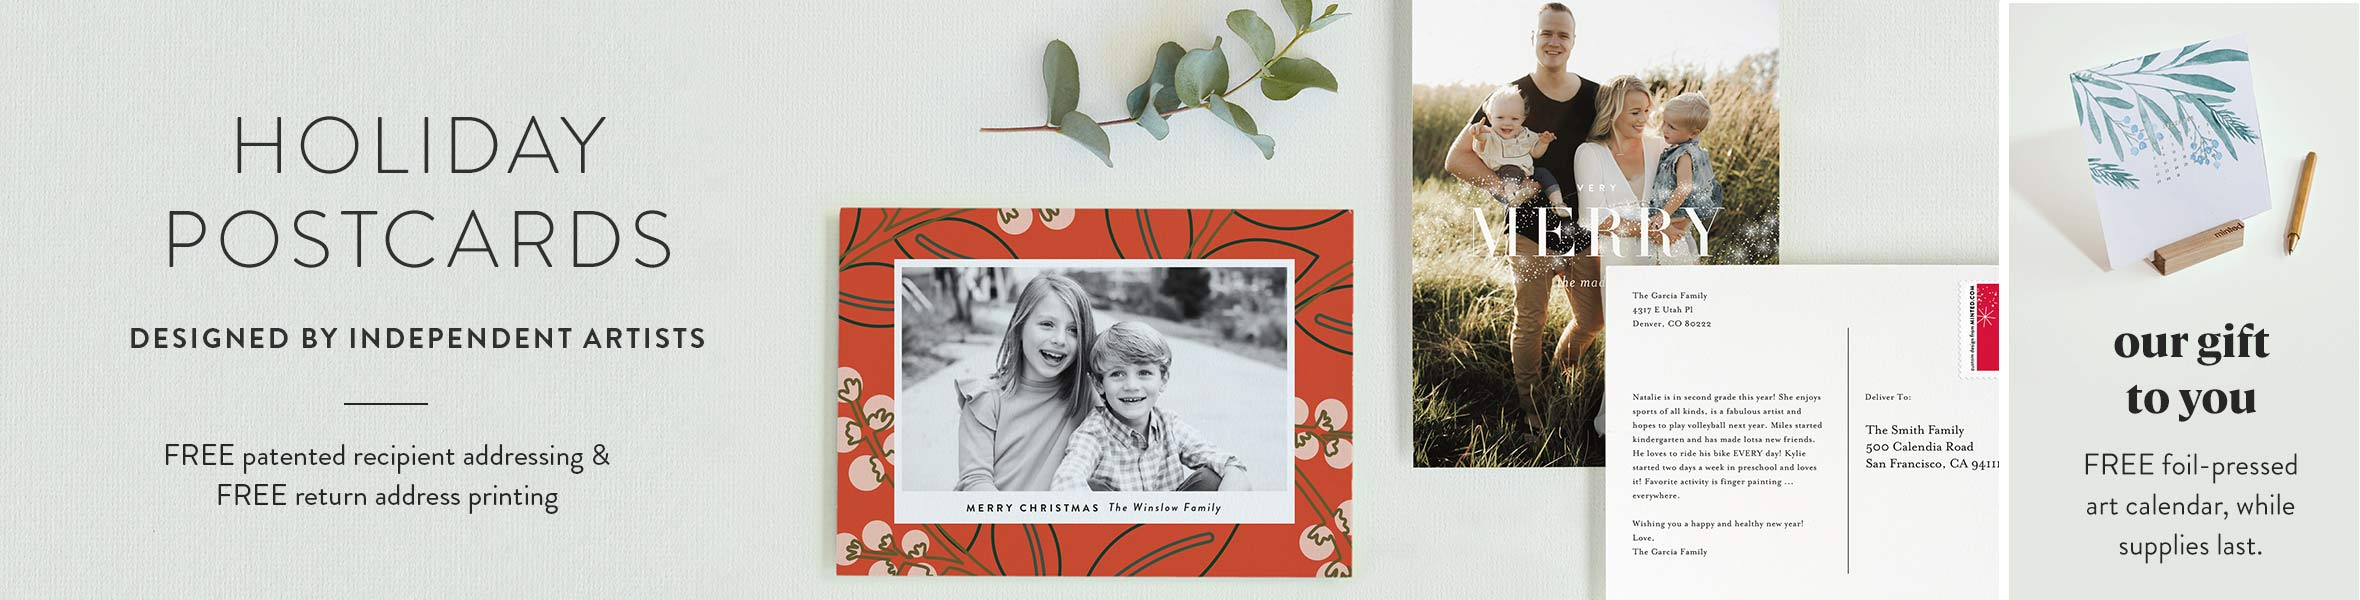 Holiday Photo Postcards